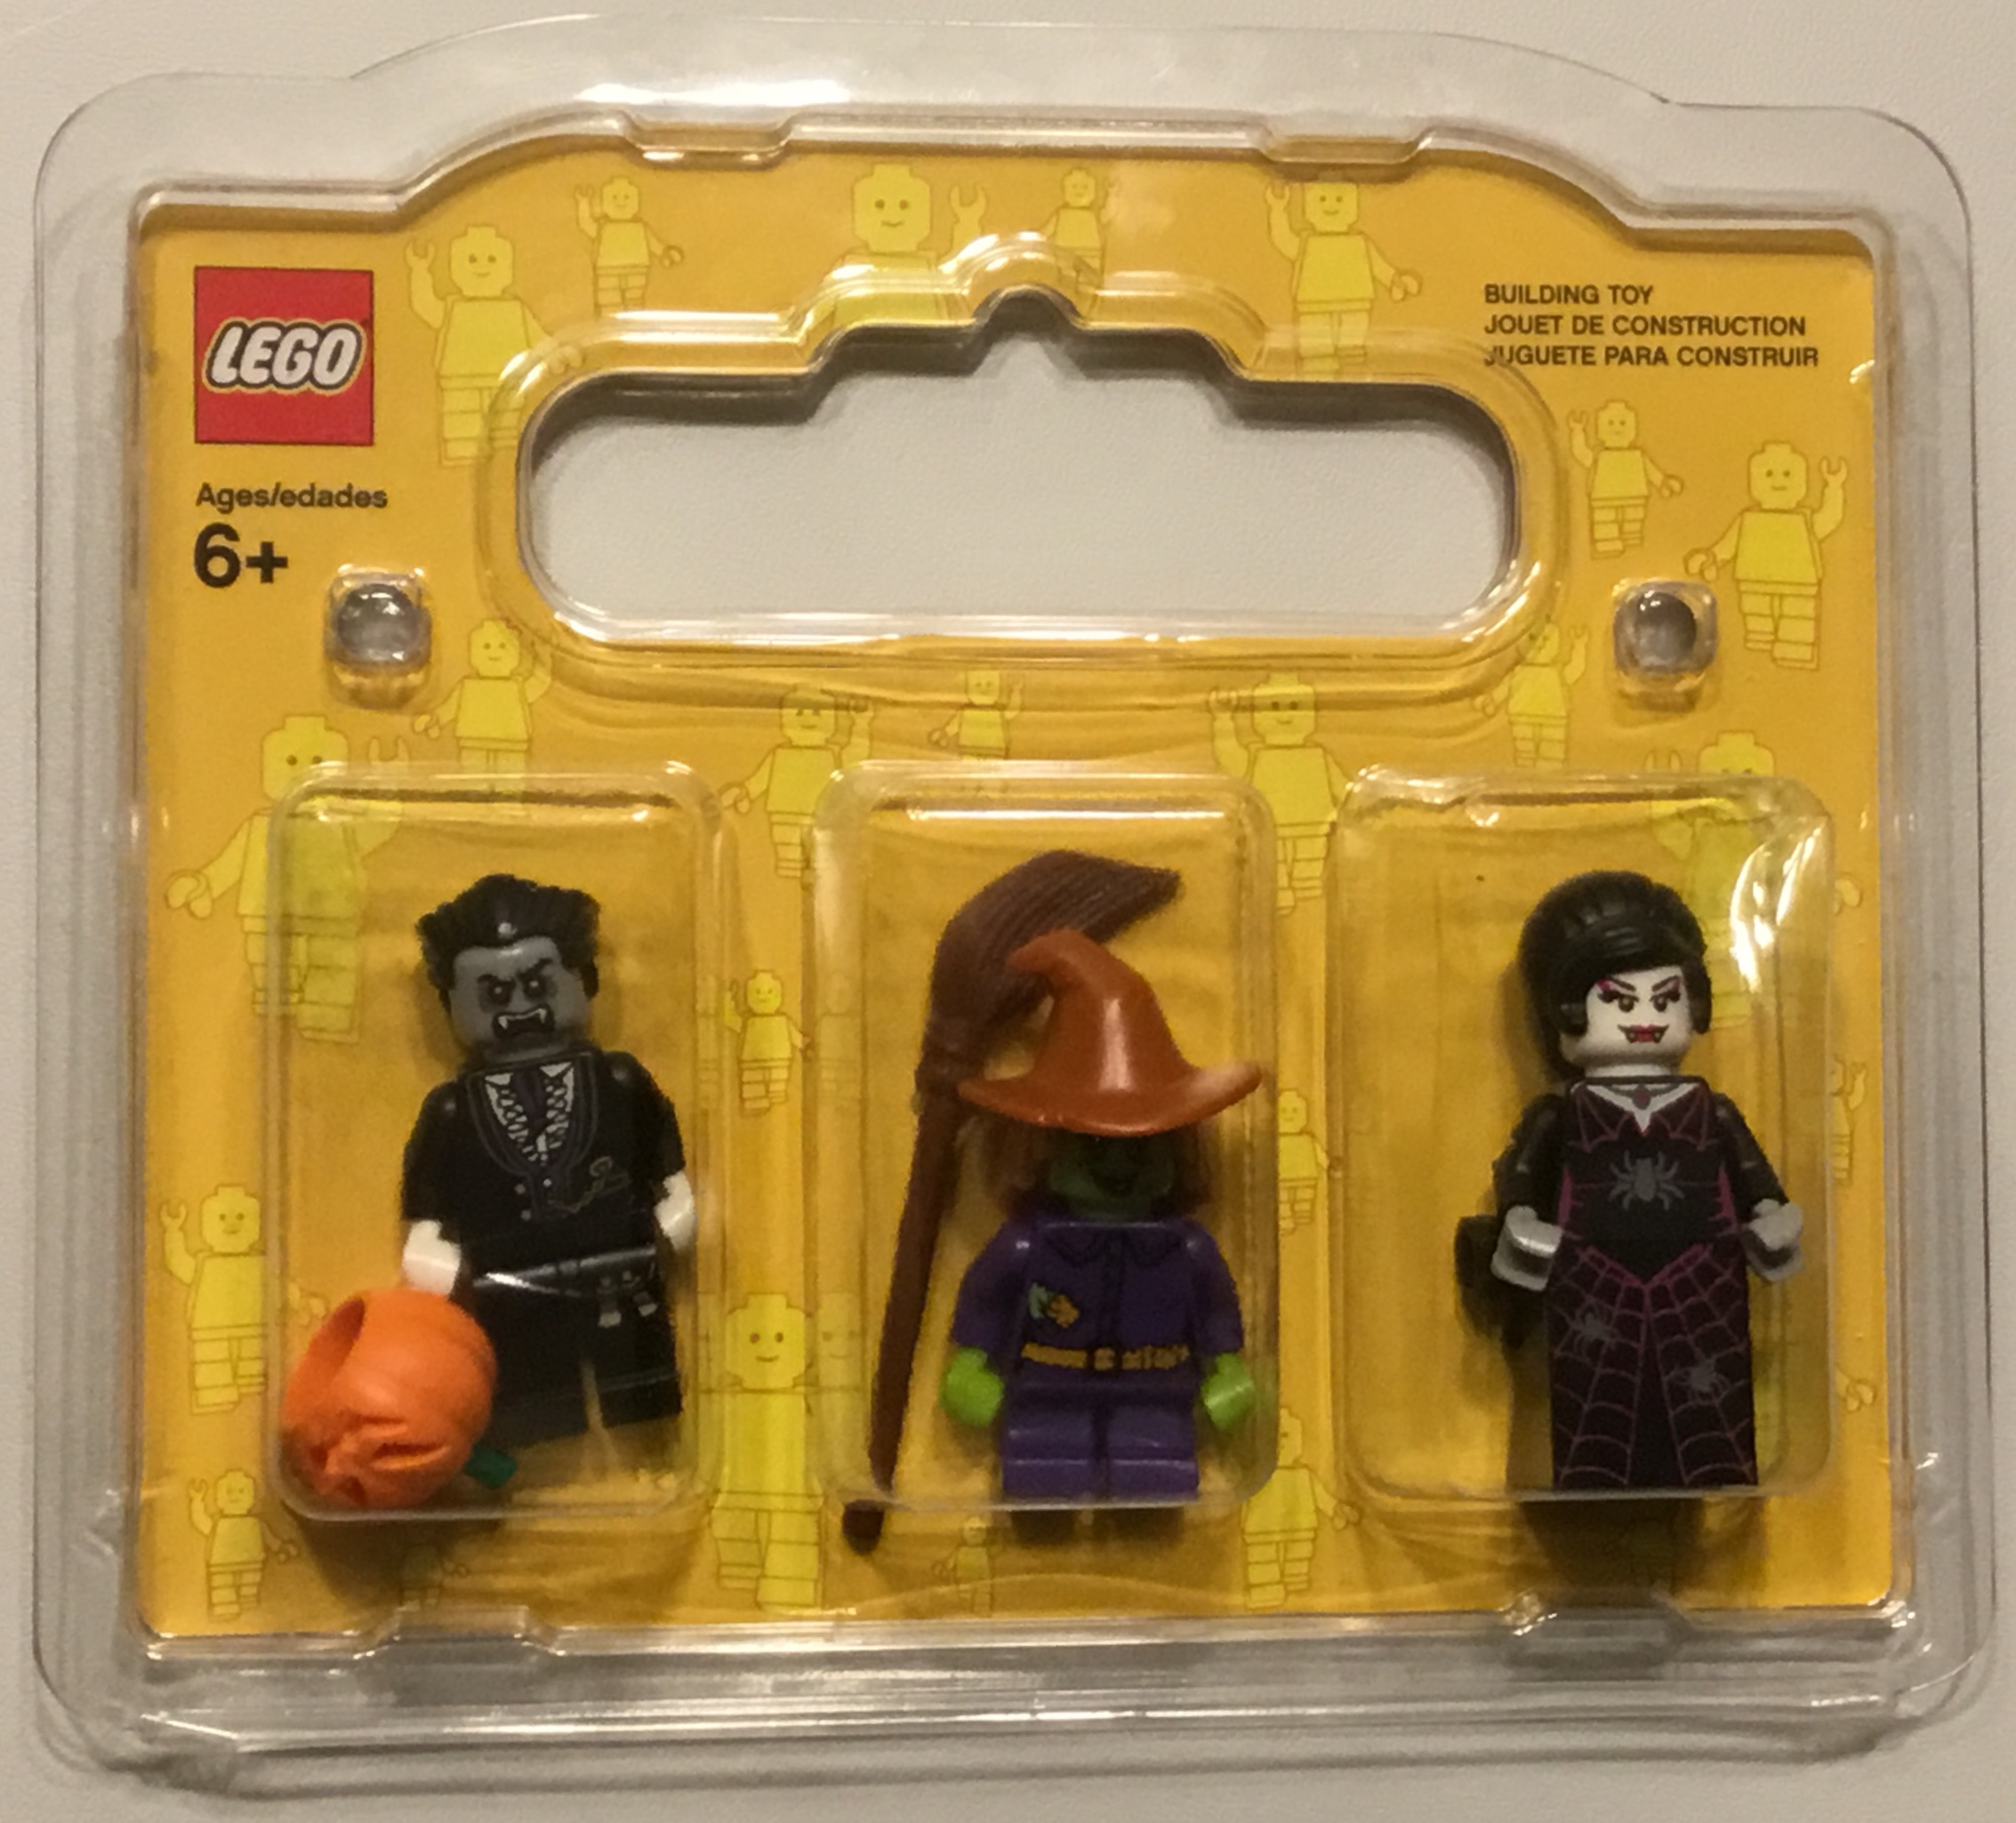 Prix Les Comparateur Briques De LegoToutes I67gmybfvY